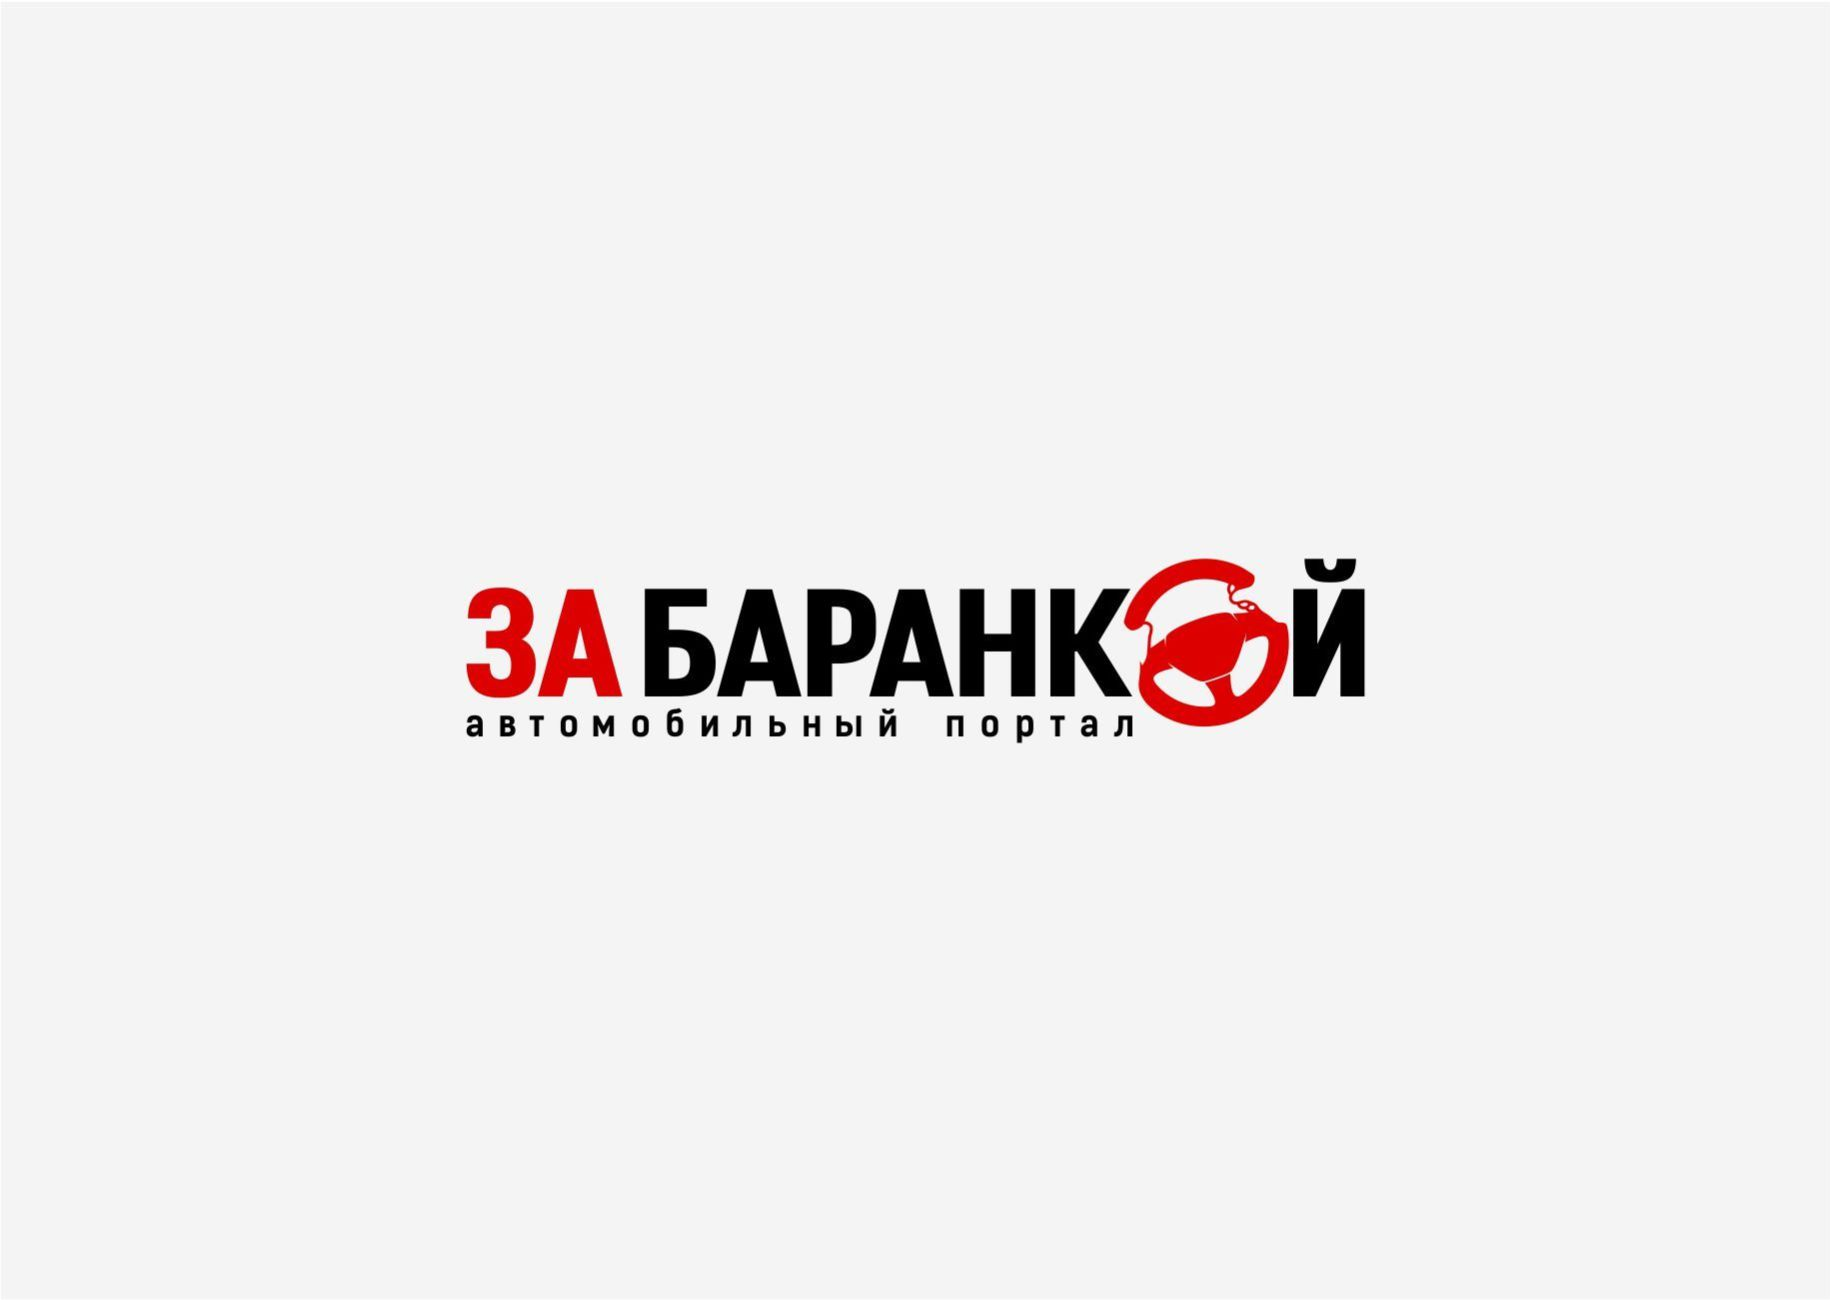 конкурс логотип автопортала